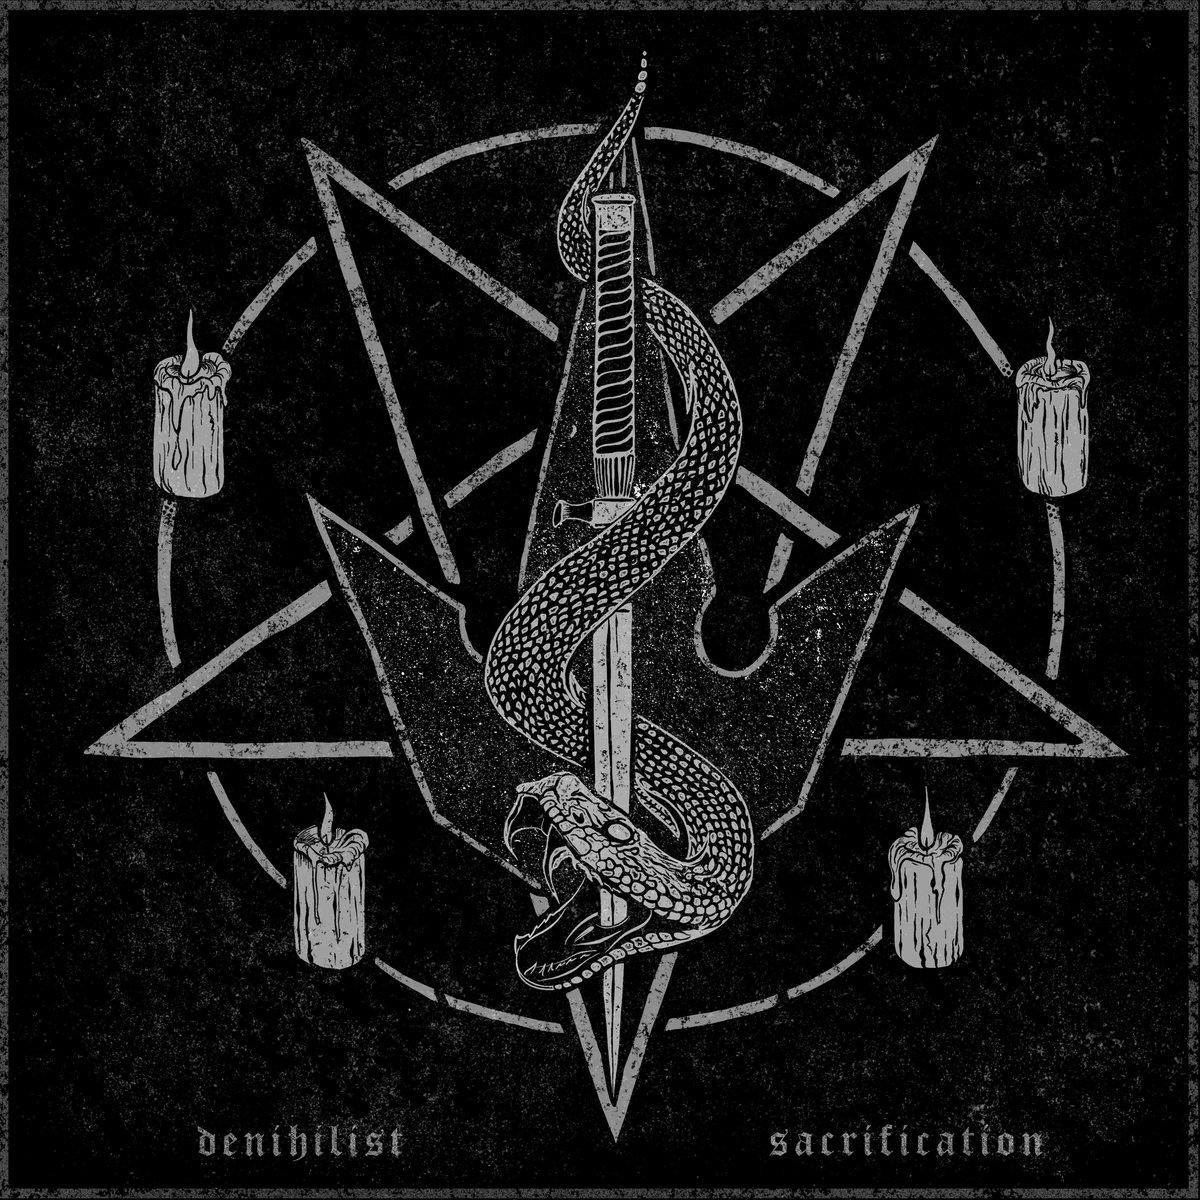 Denihilist - Bohemia [single] (2017)